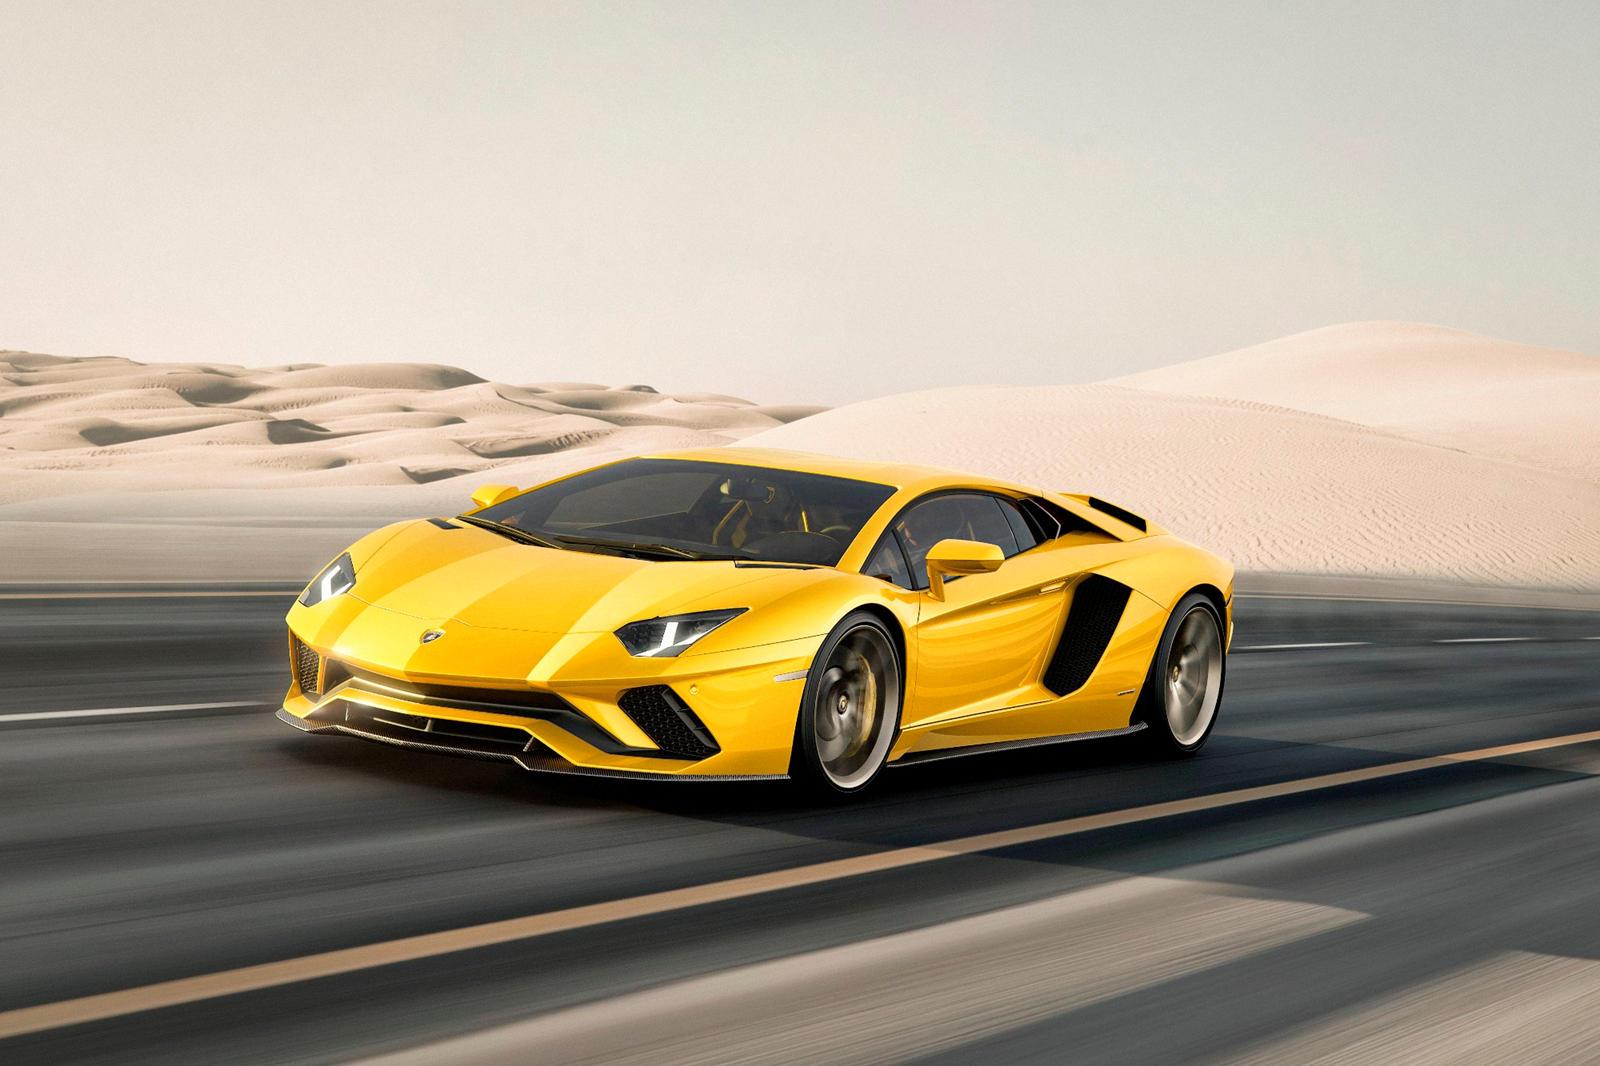 2018 Lamborghini Aventador S Coupe Review, Trims, Specs and Price ...